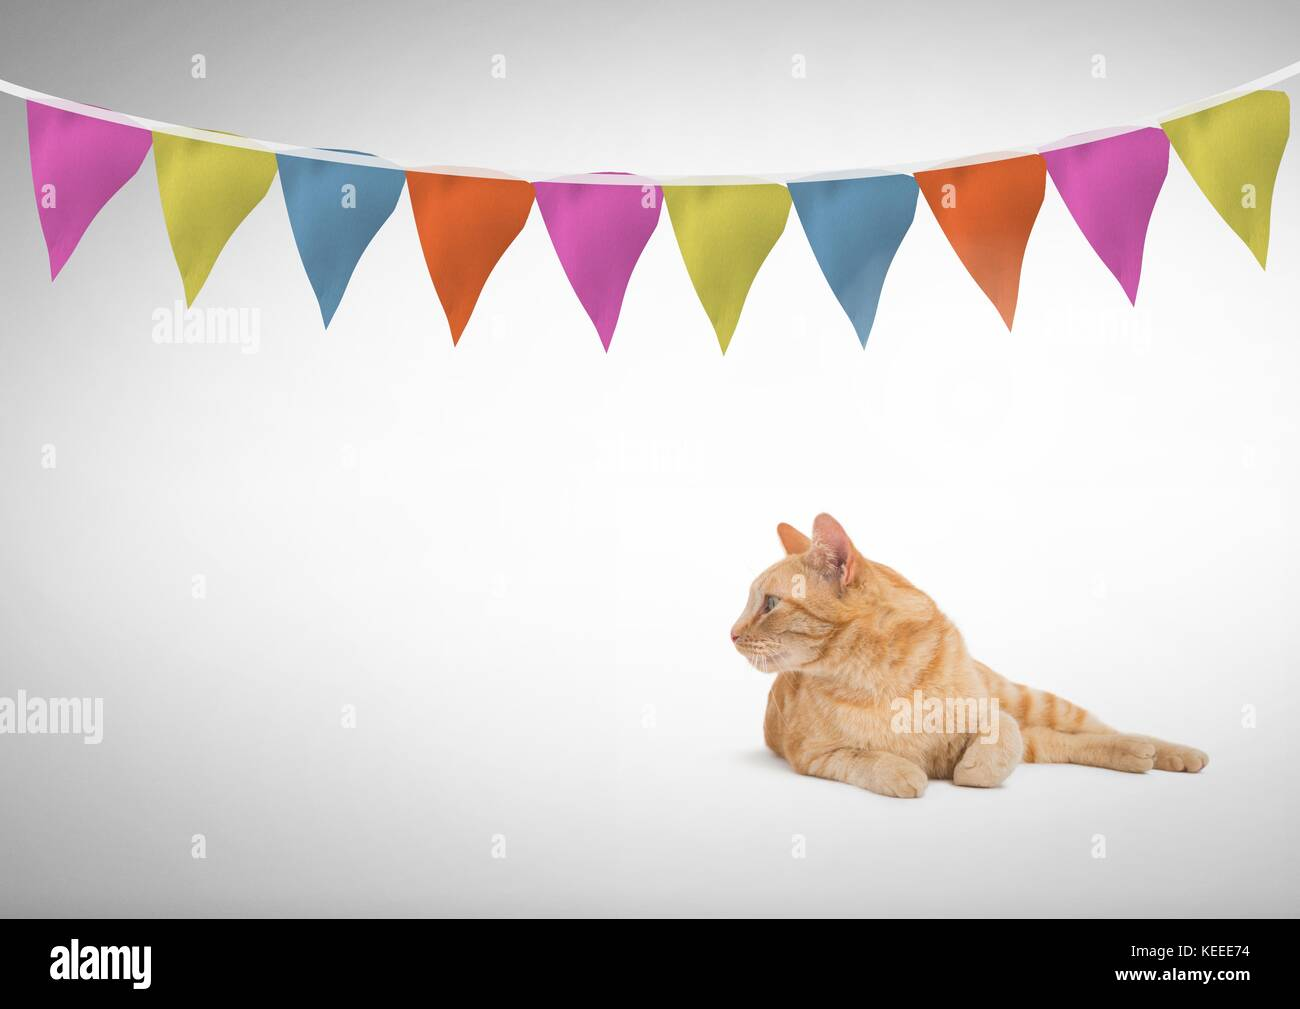 digital composite of cat looking left under colorful flag banner